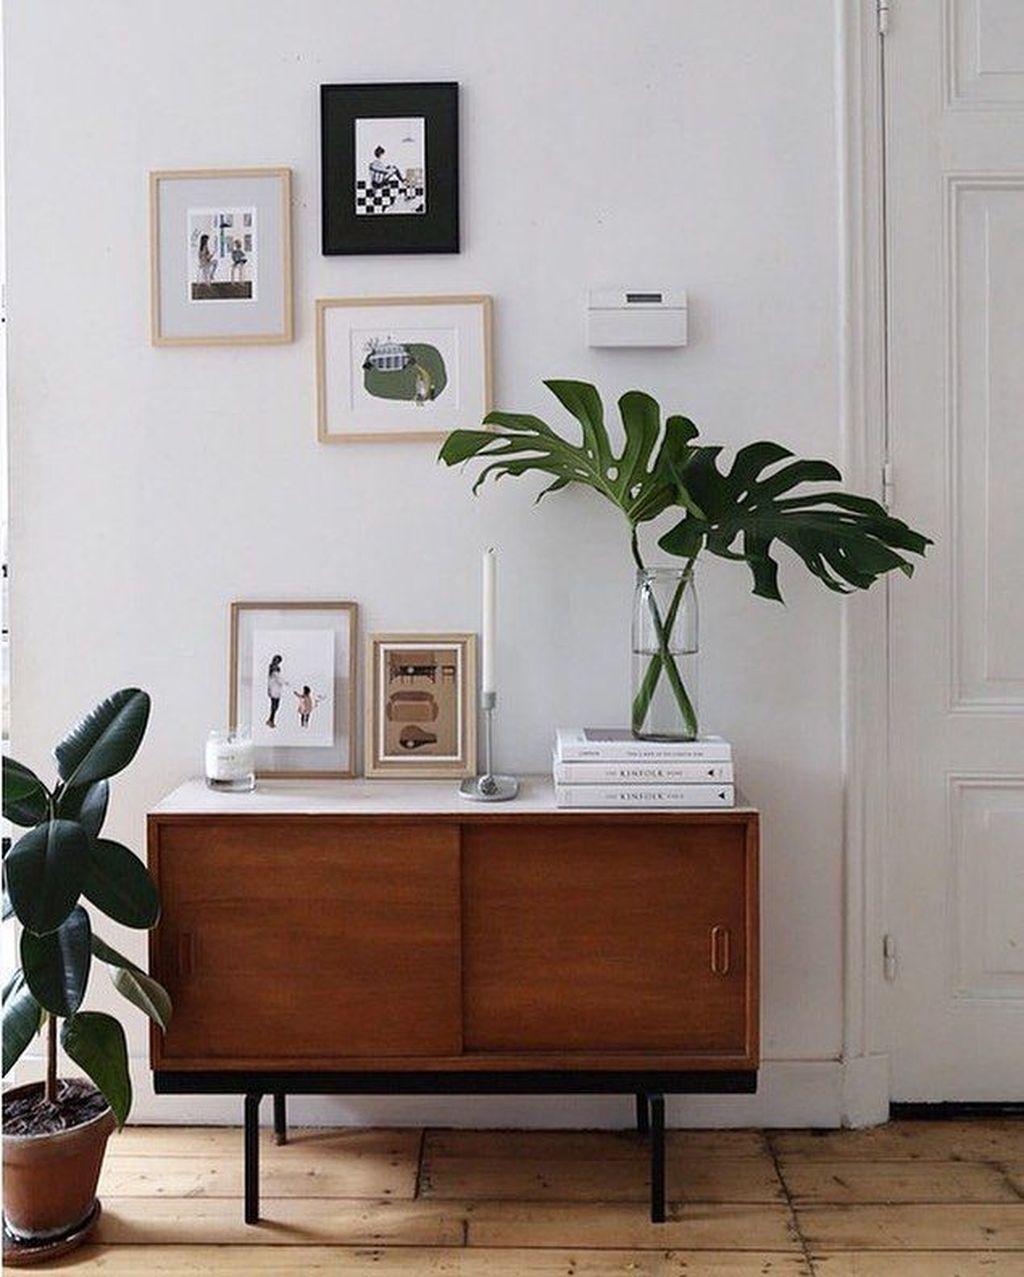 Inspiring Modern Home Furnishings Design Ideas 09